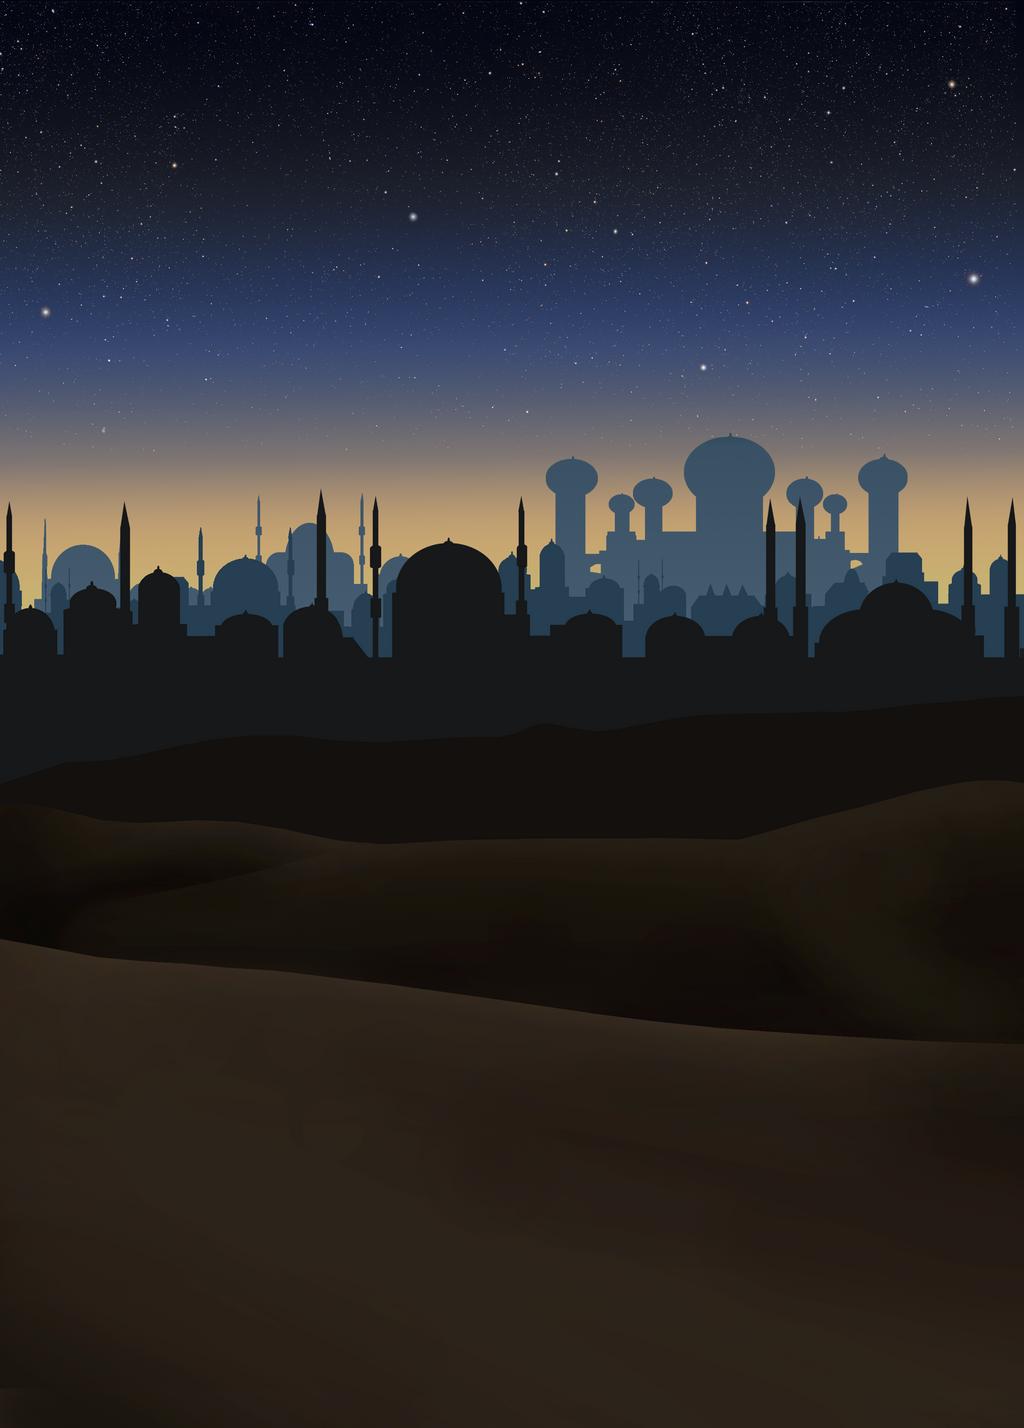 stock  aladdin night scene background by greyfaerie4 on